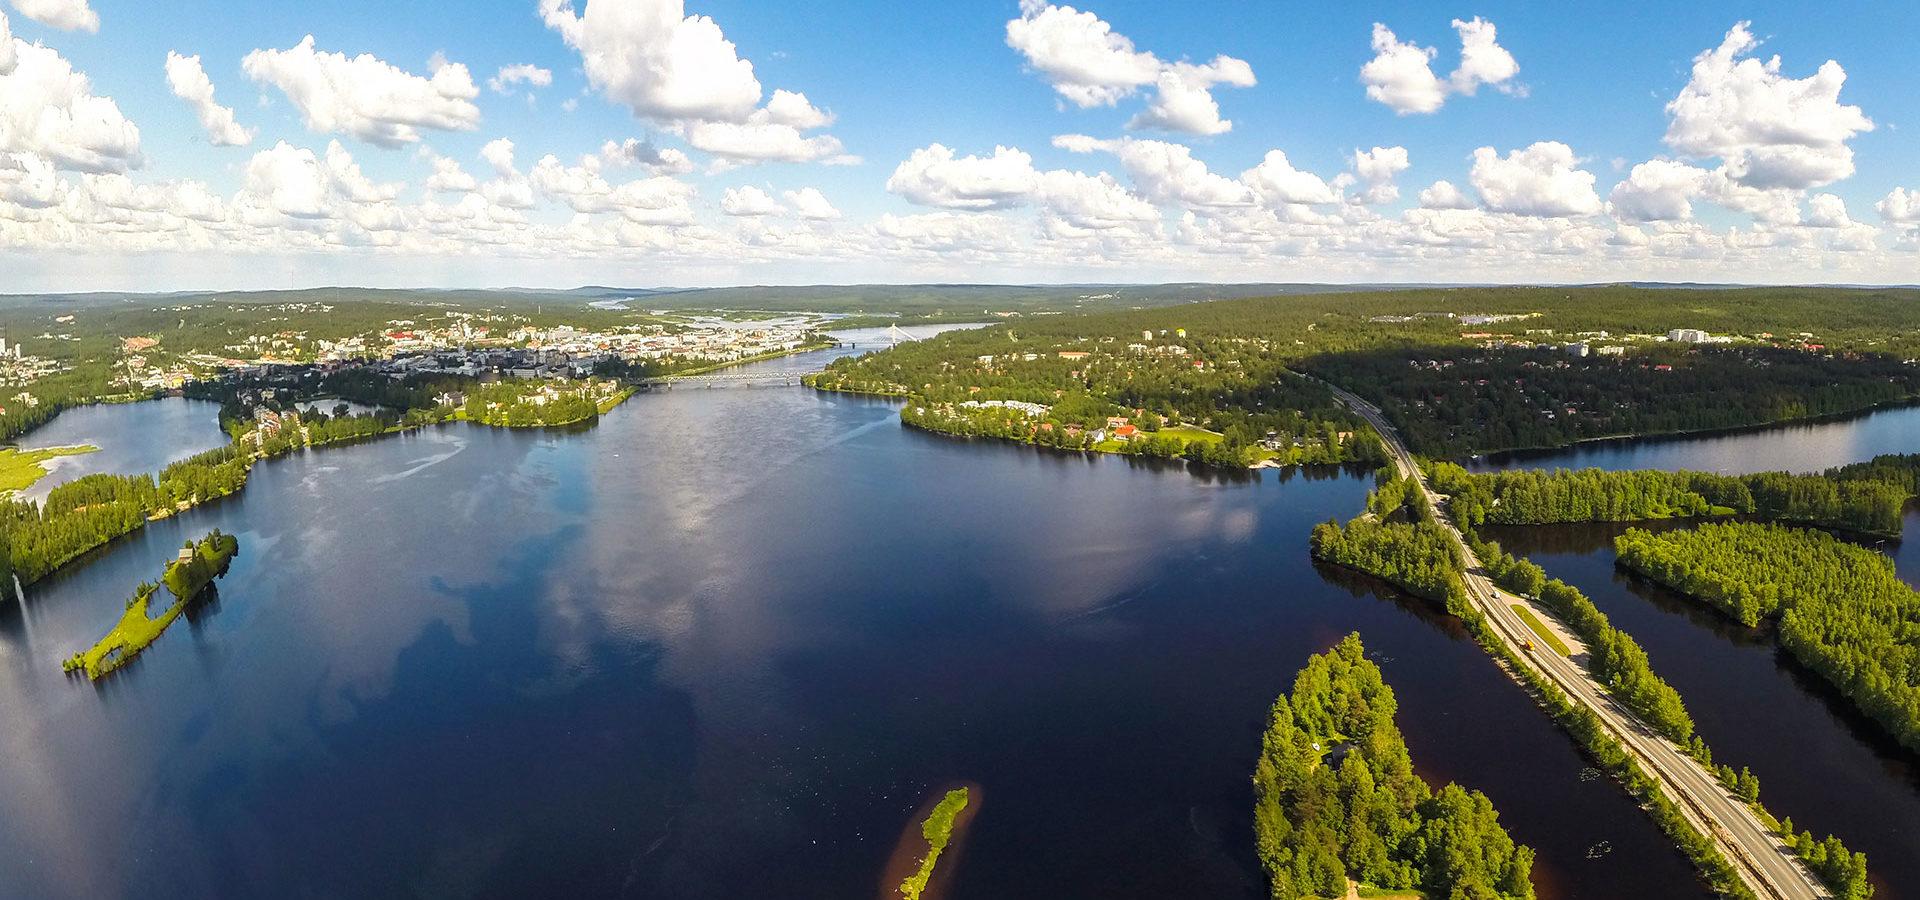 Rovaniemen kaupunki